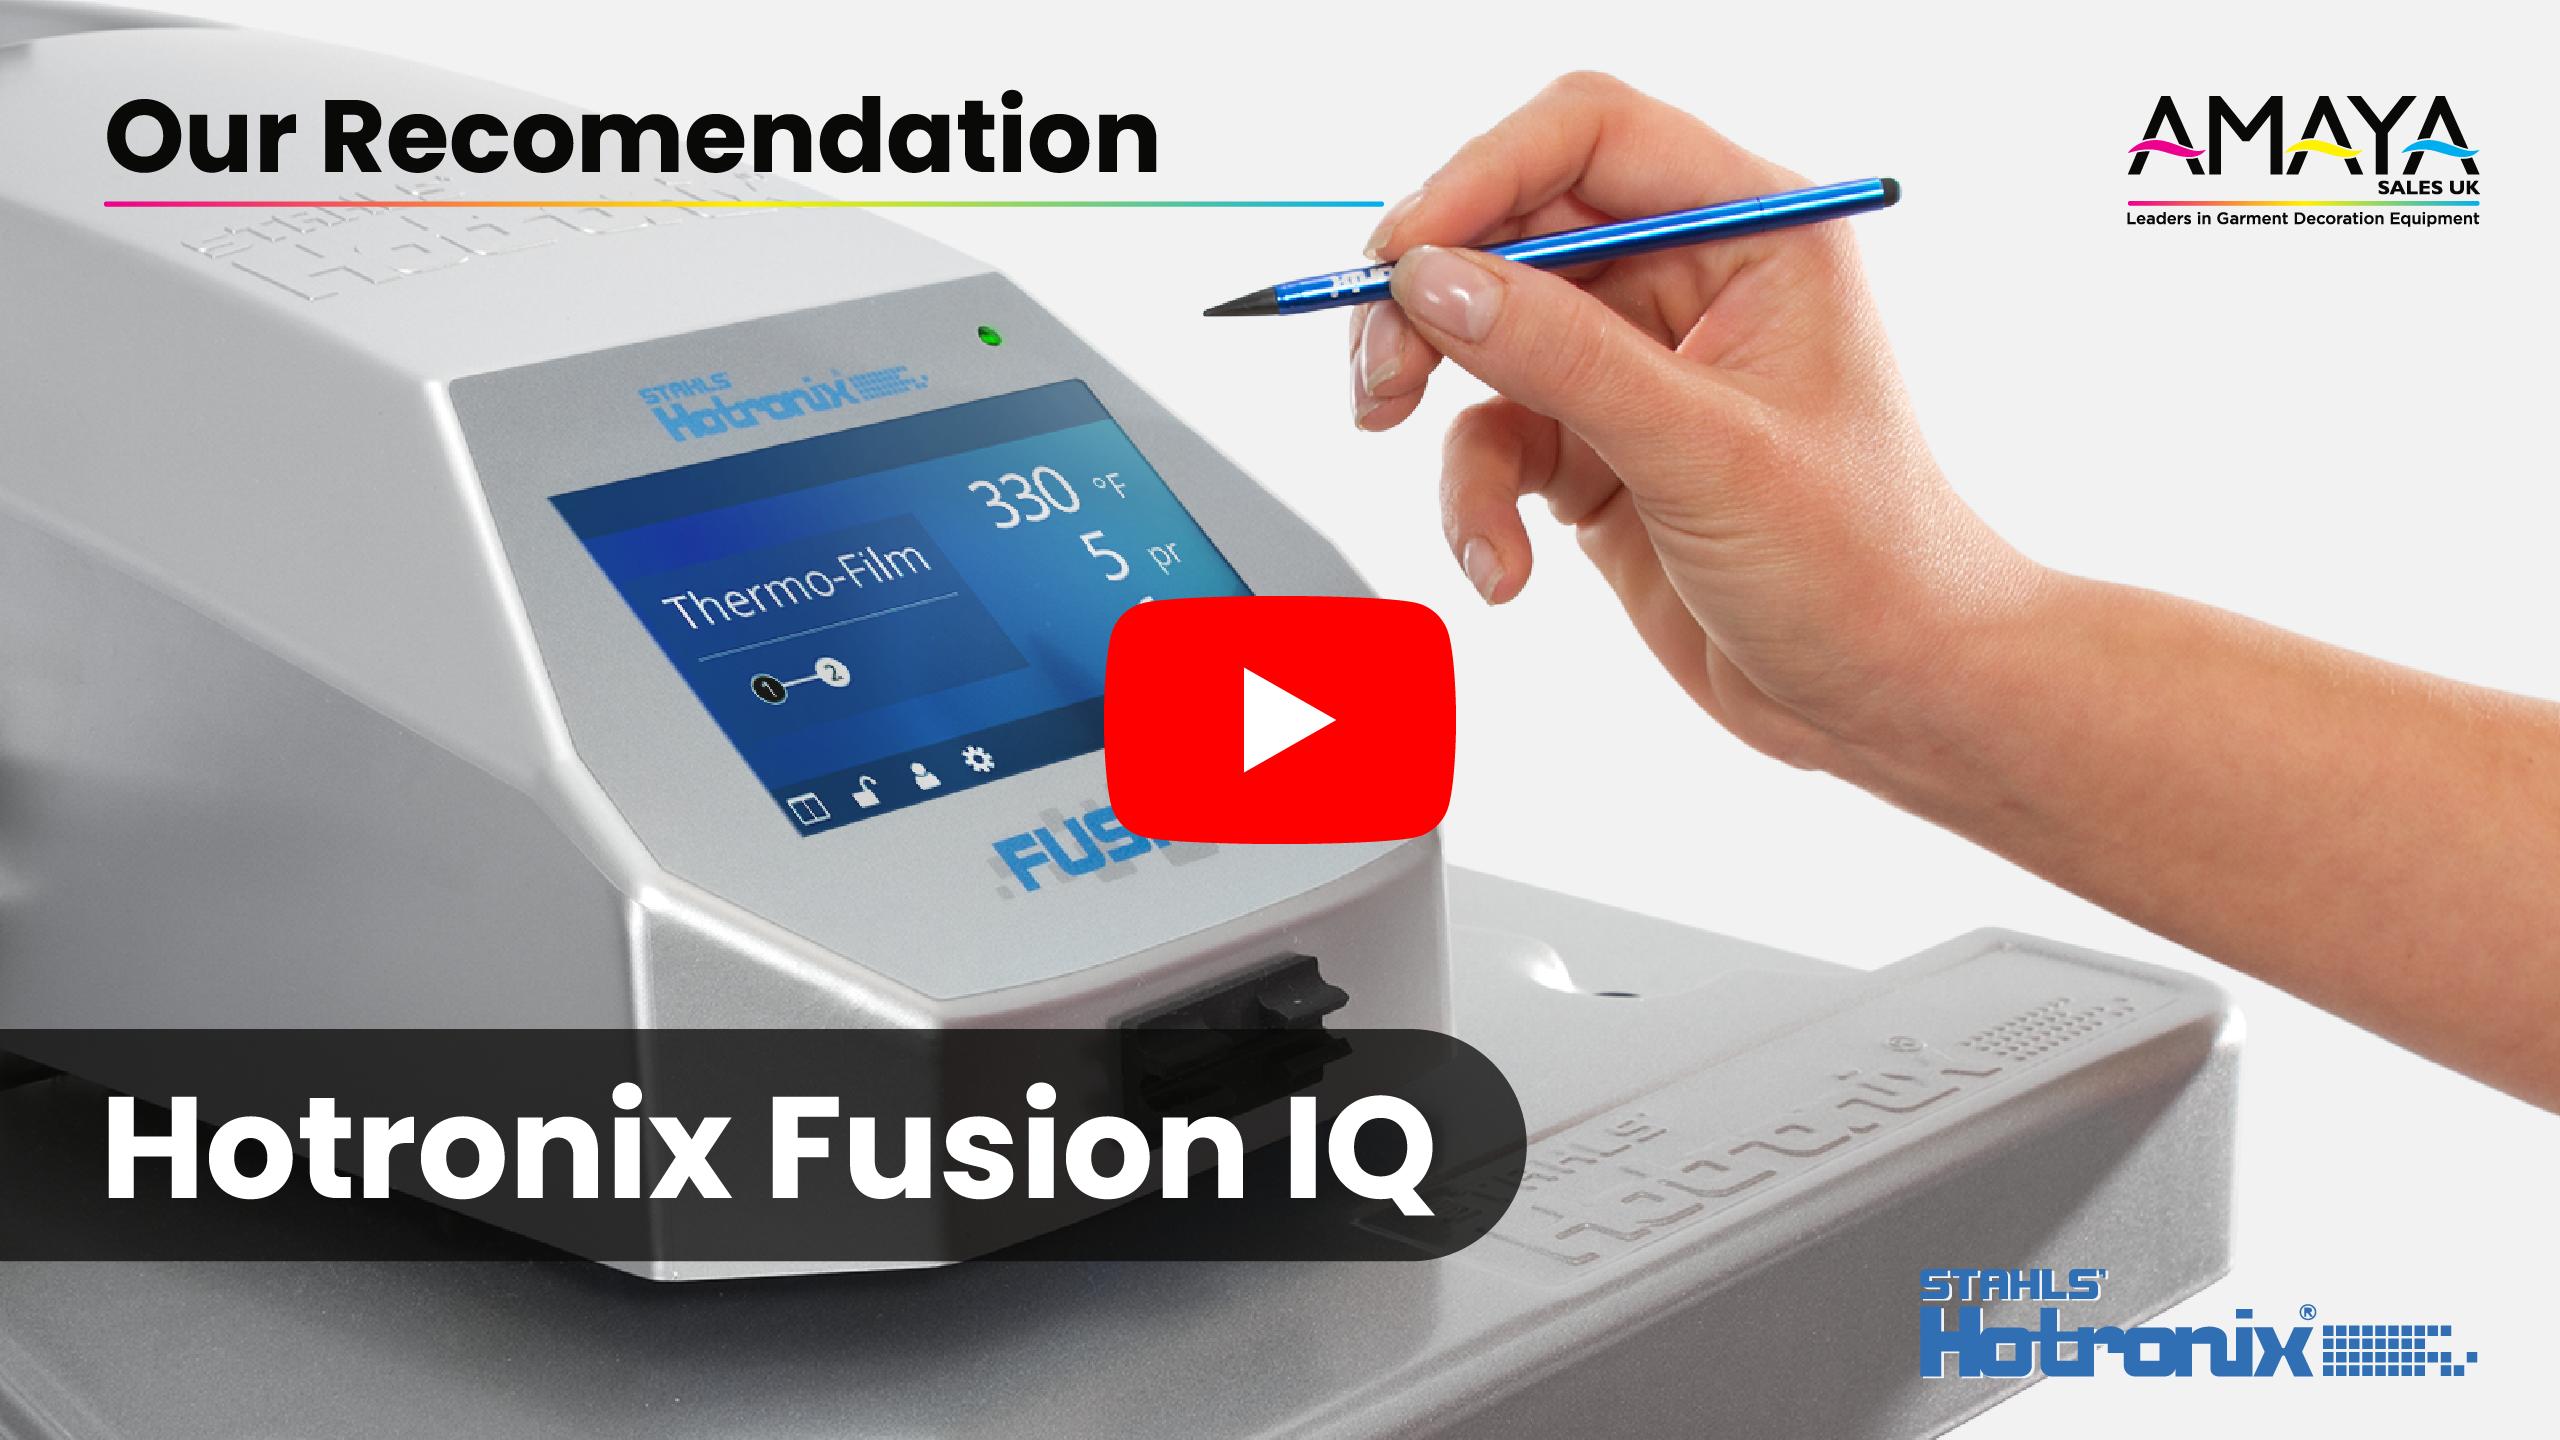 Recomended Heatpress Hotronix Fusion IQ